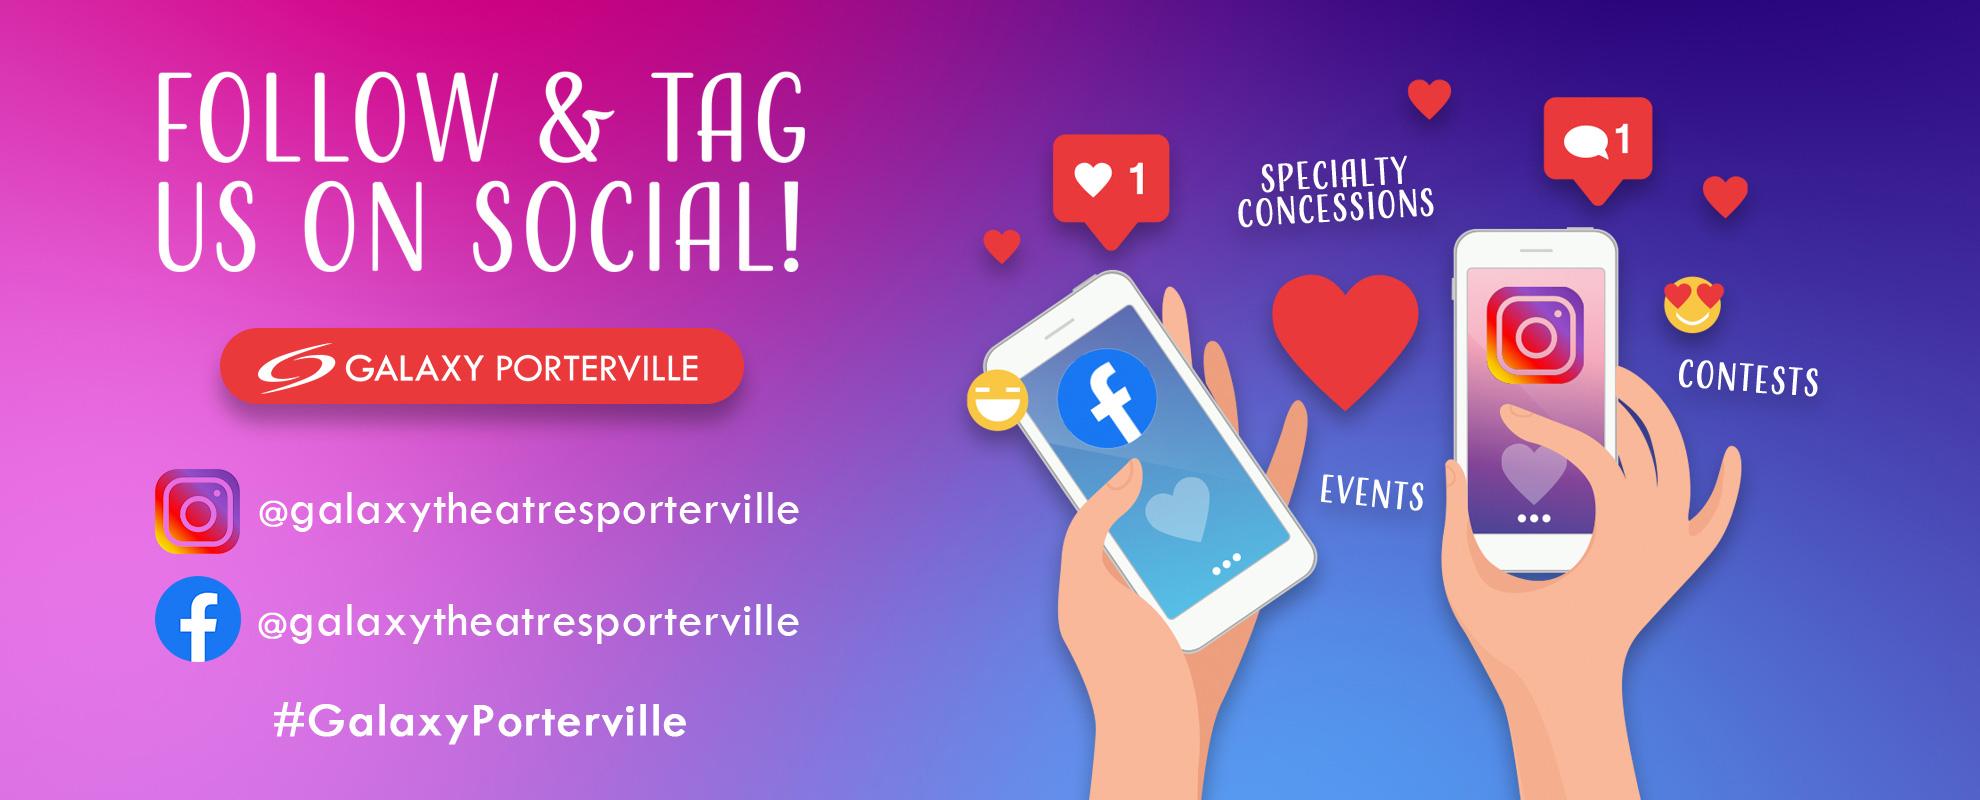 Socials/Hashtag - Porterville image